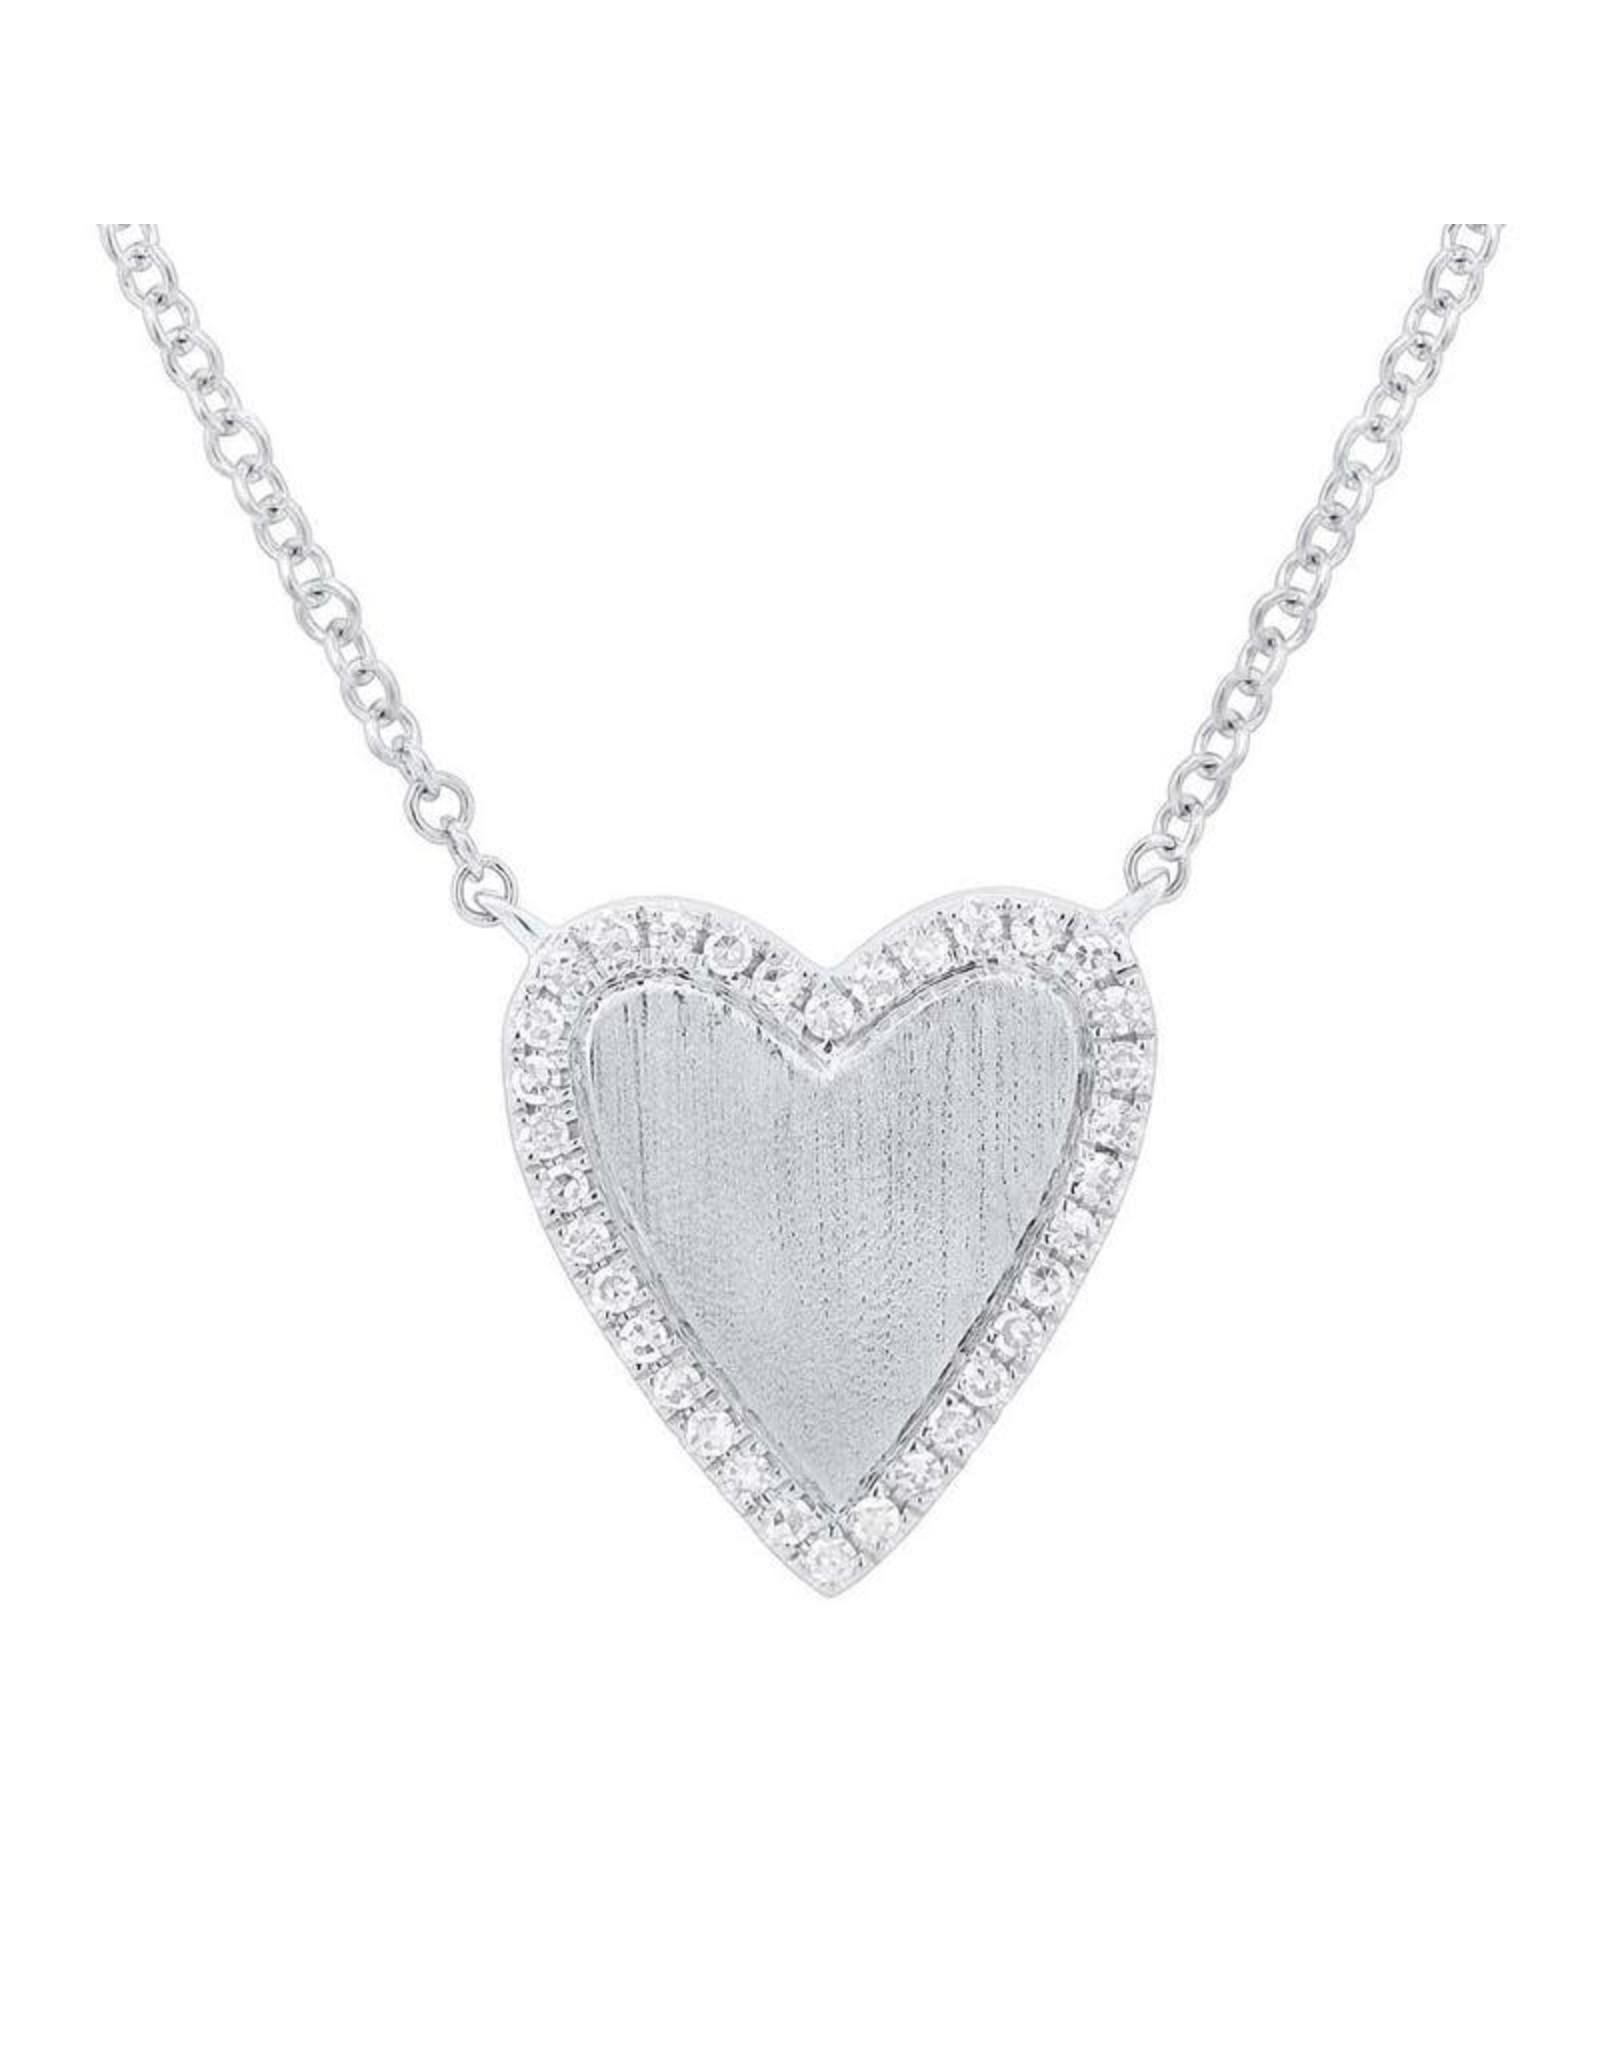 14K White Gold Diamond Matte Heart Necklace, D: 0.09ct